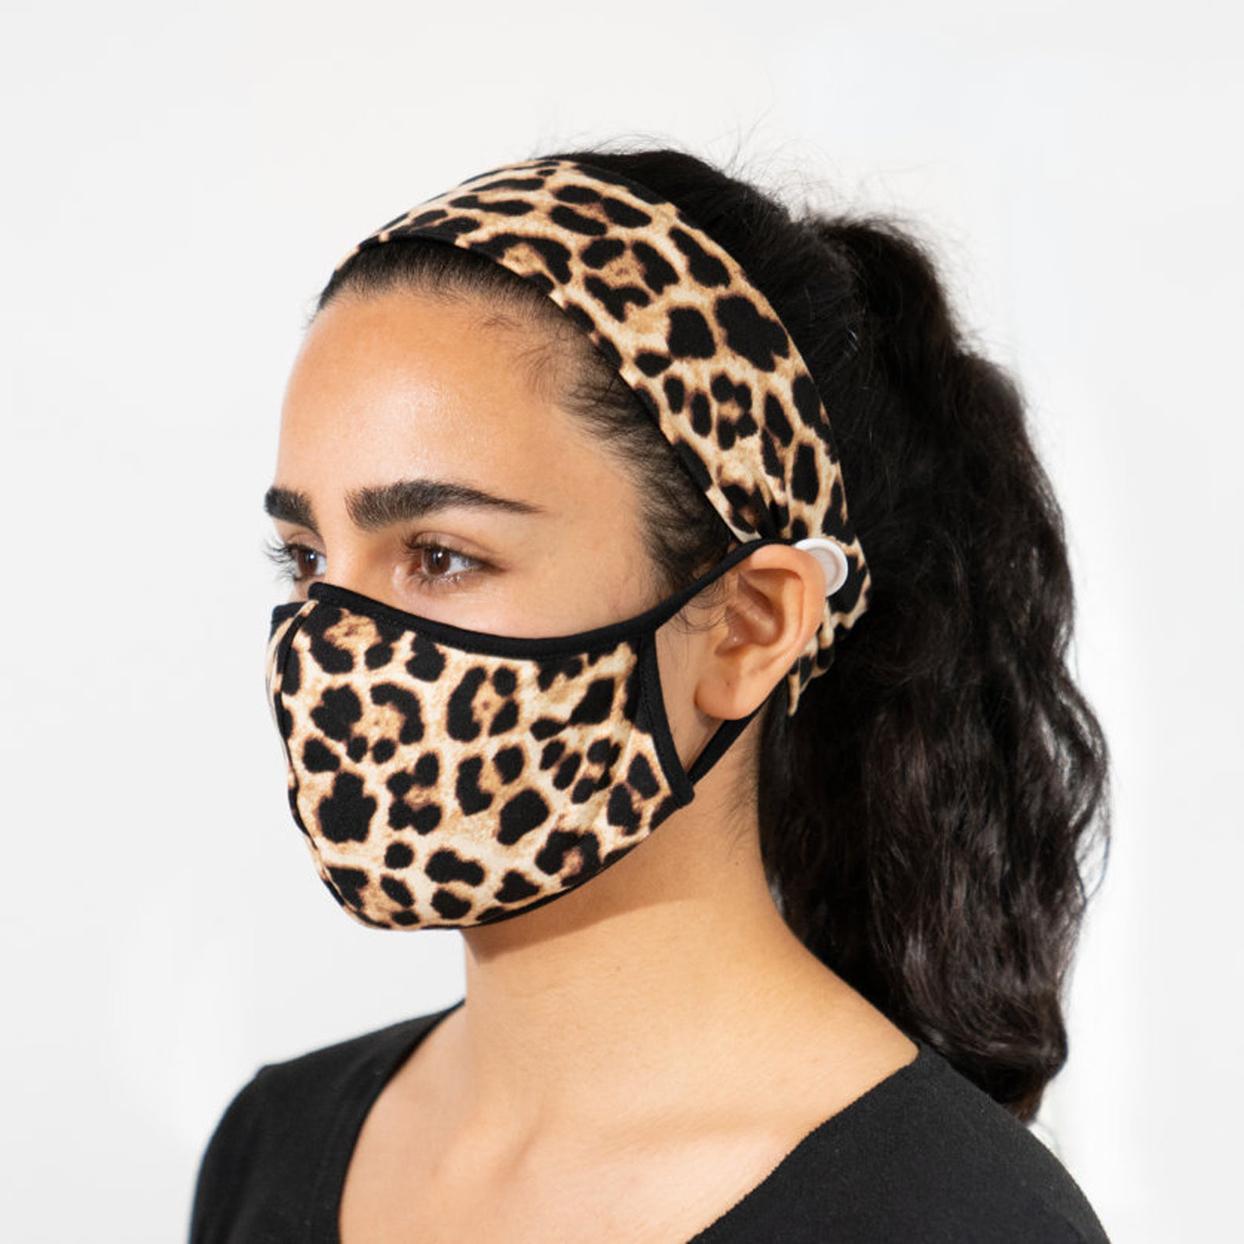 Leopard Face Mask Headband Set